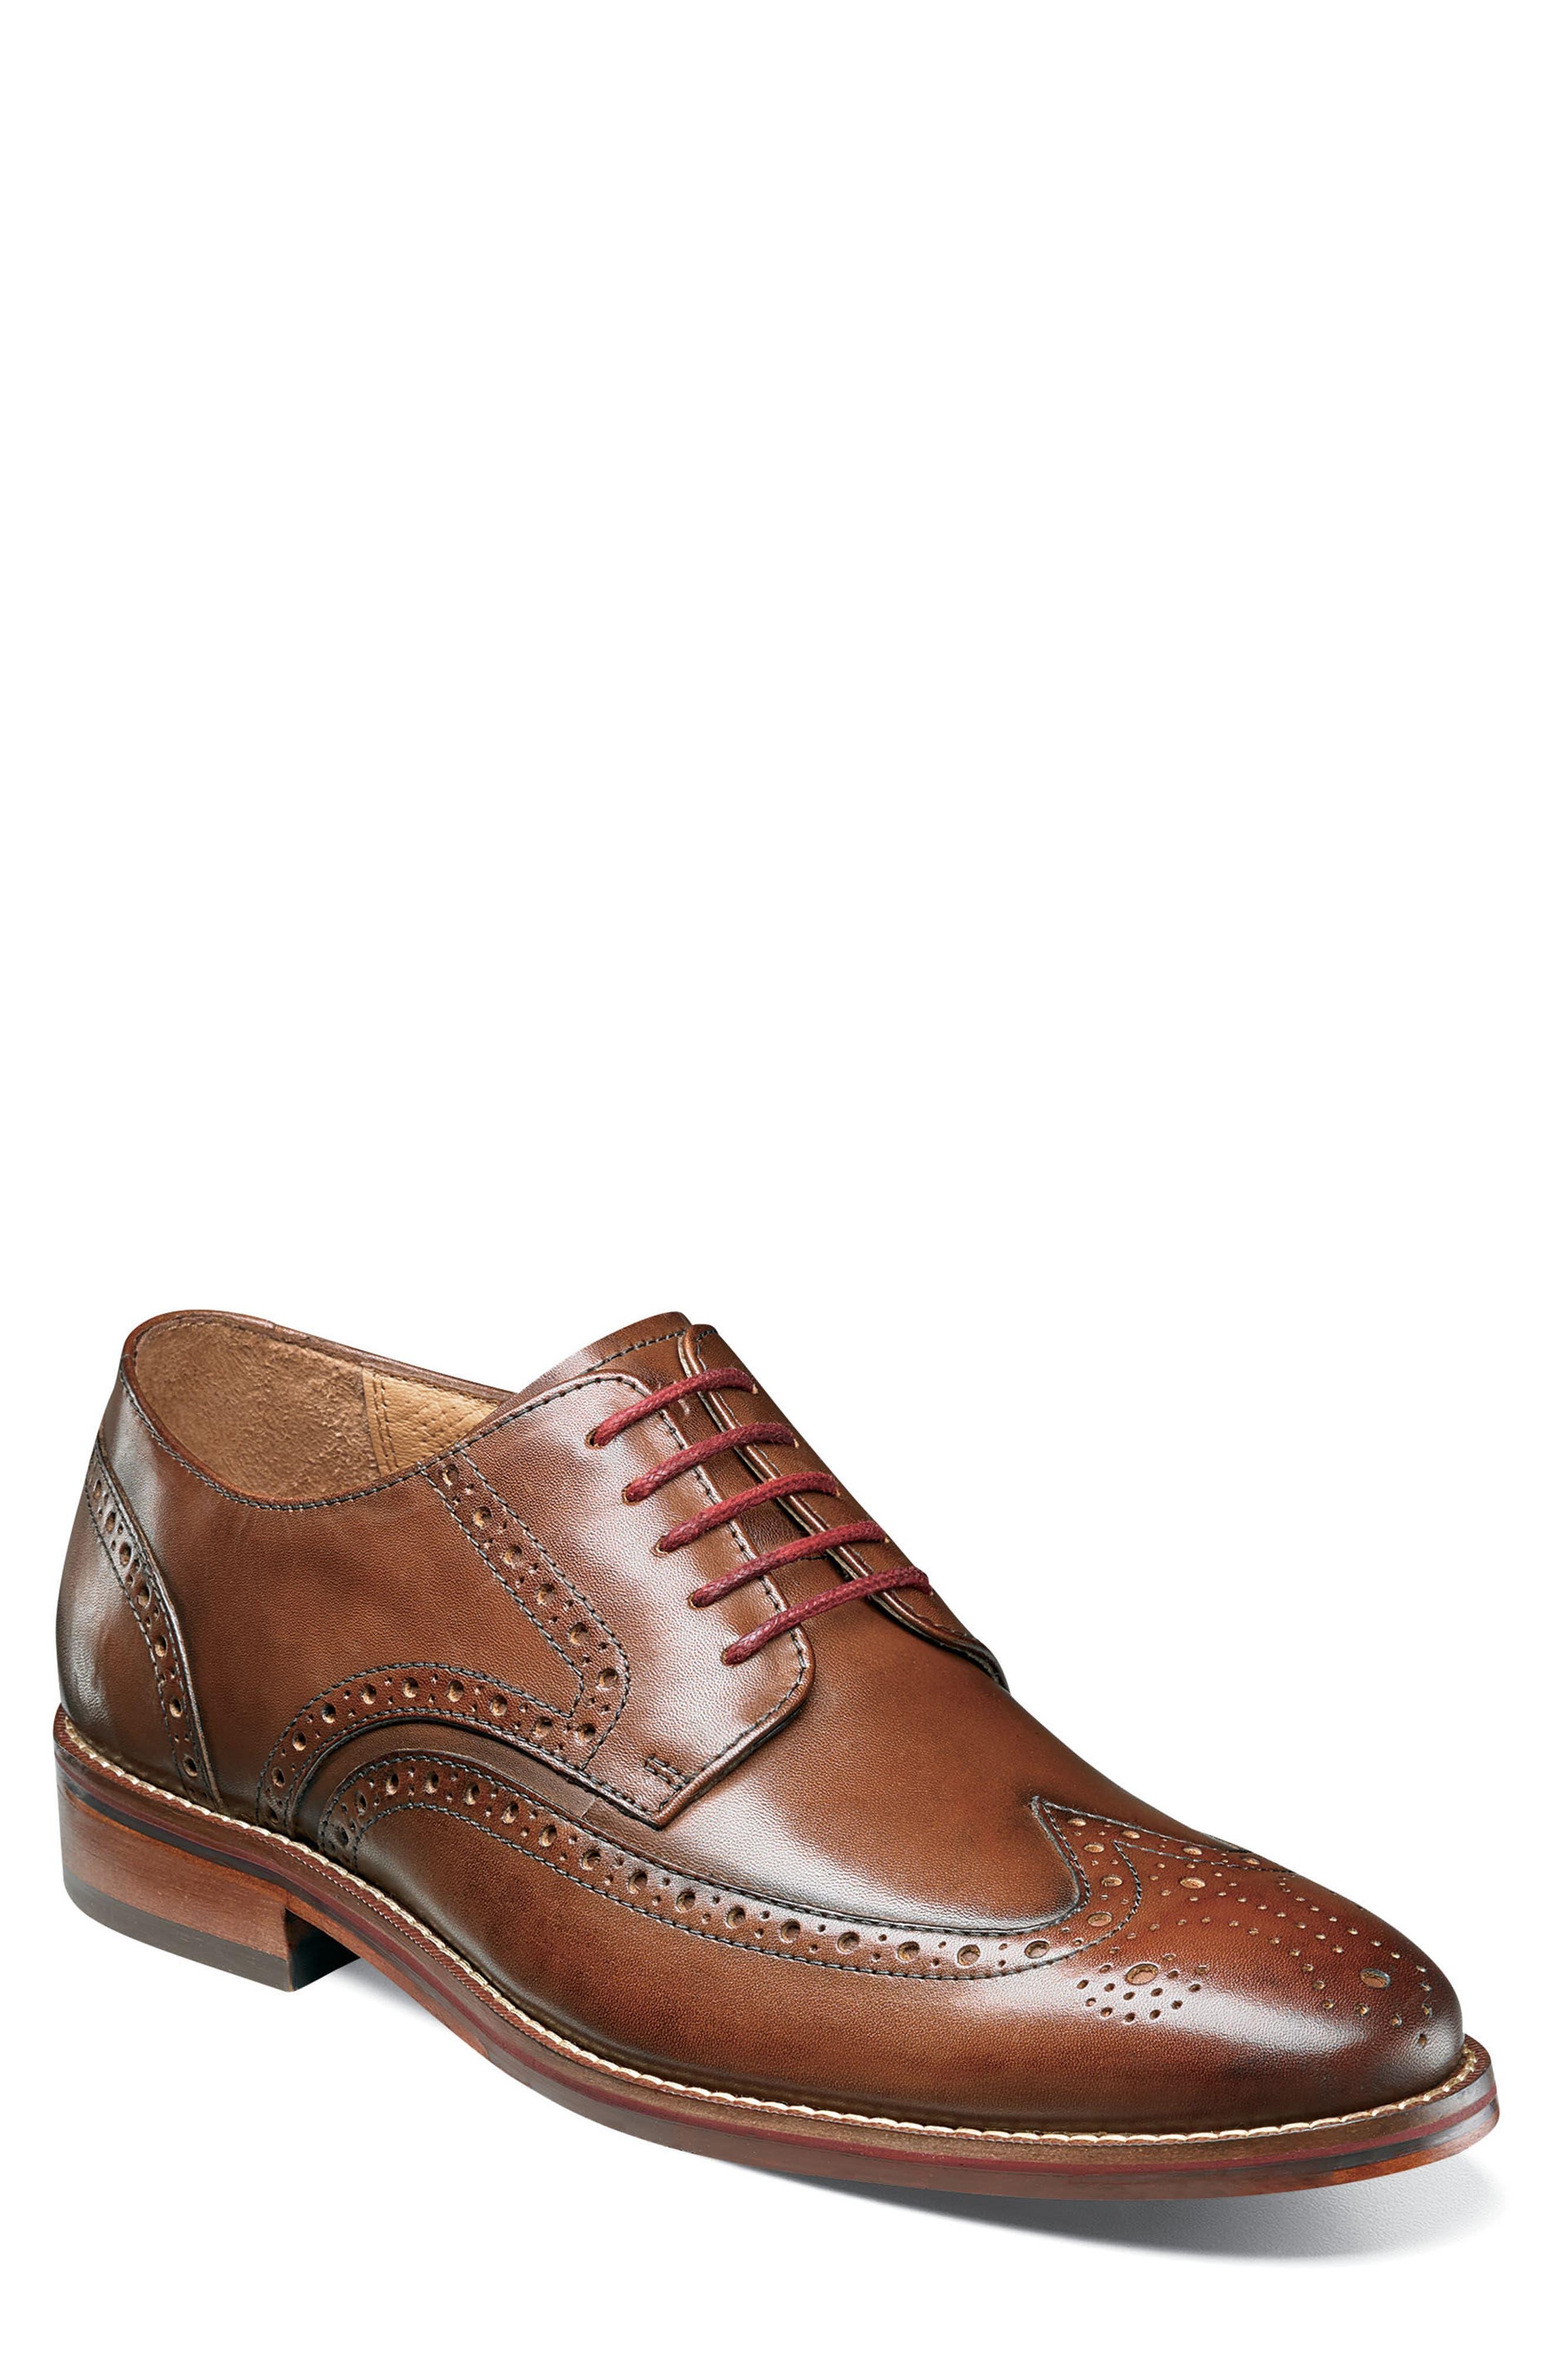 Salerno Wingtip,                             Main thumbnail 1, color,                             Cognac Leather